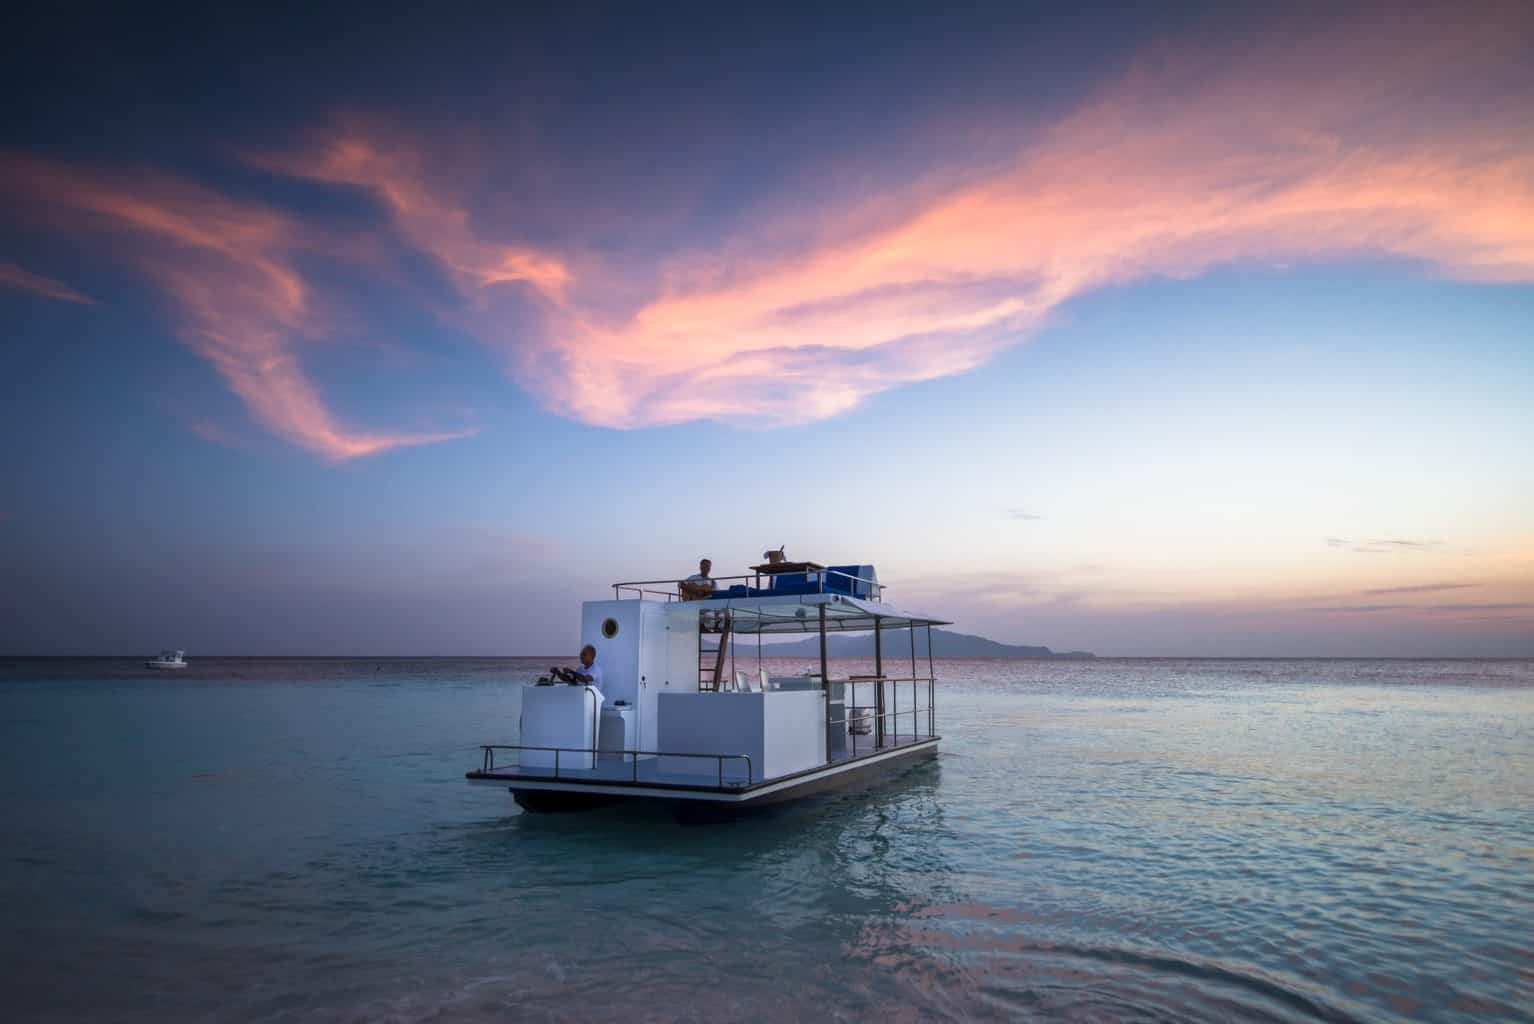 lua-de-mel-filipinas-hotel-amanpulo-Sunset-Cruise